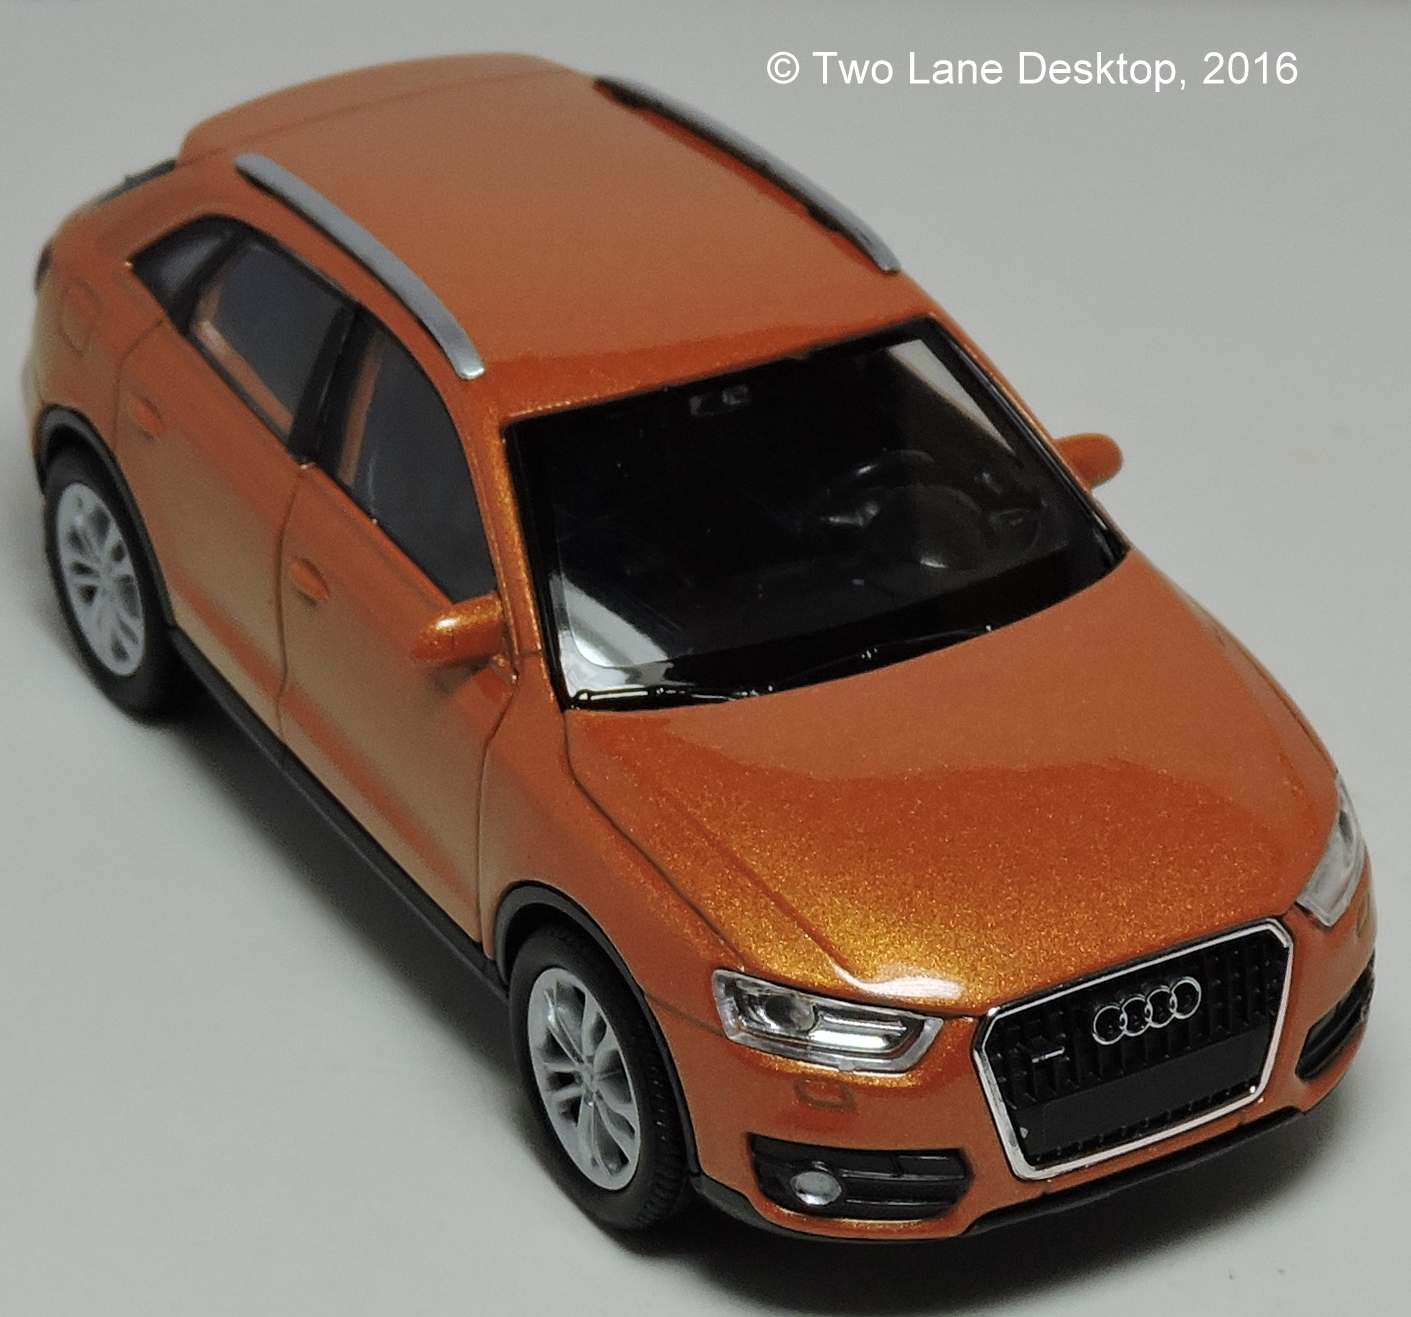 Two Lane Desktop: Welly 1:43 Audi Q3 SUV